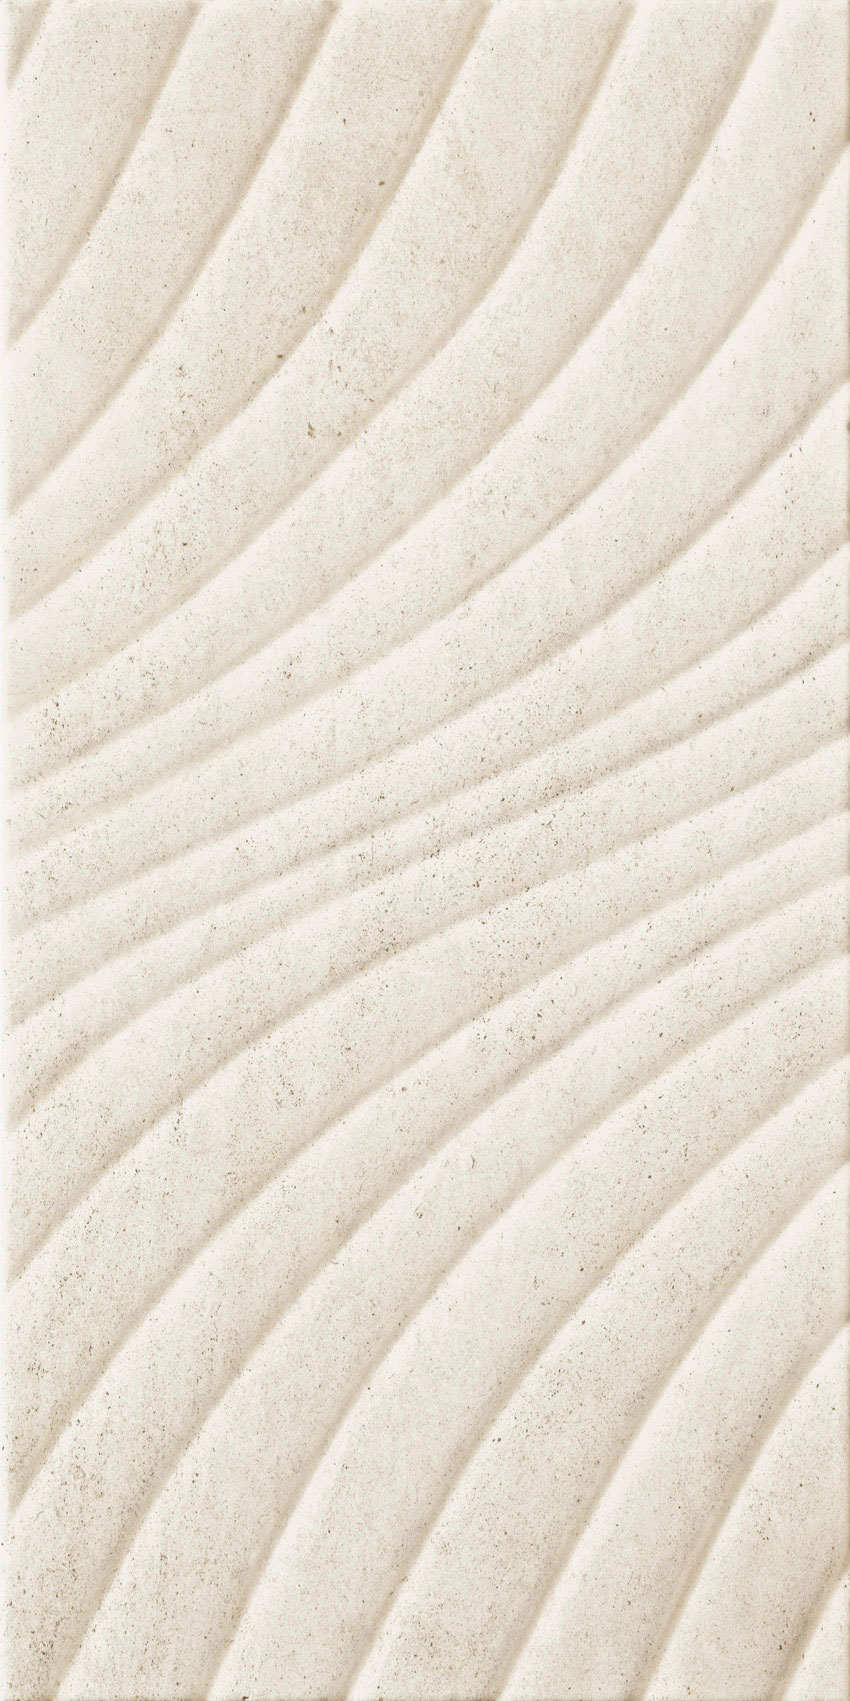 Настенная плитка Ceramika Paradyz Emilly Beige struktura 30x60 (0,9) настенная плитка azteca elite rock beige 30x60